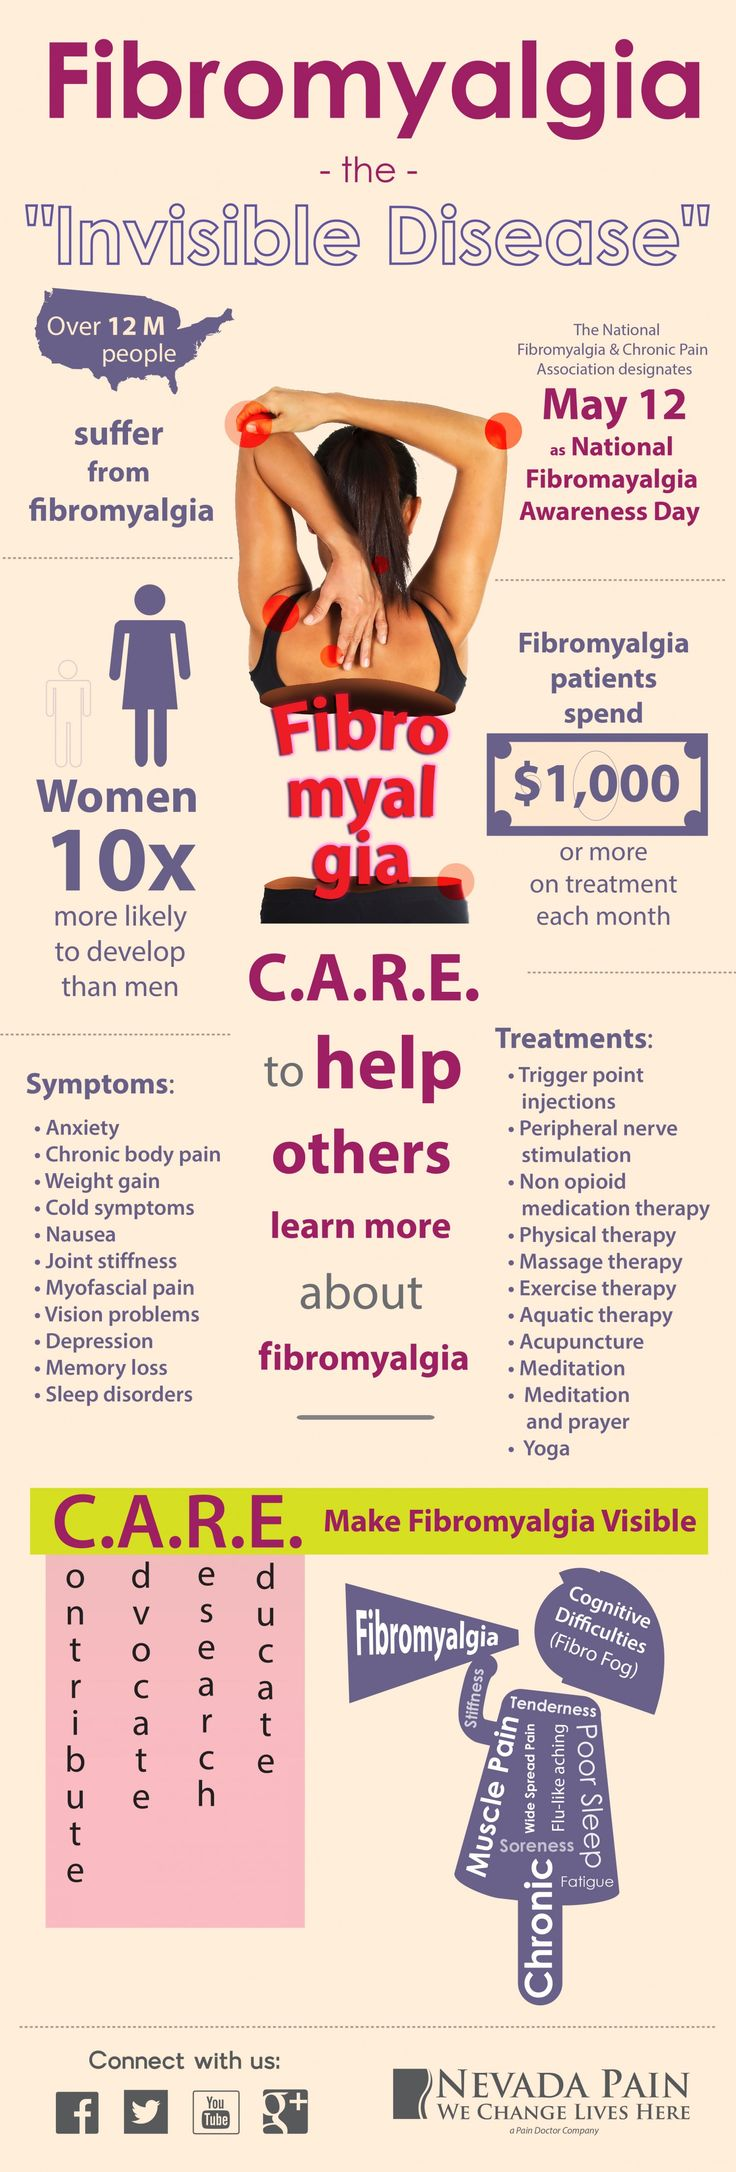 Fibromyalgia dating website